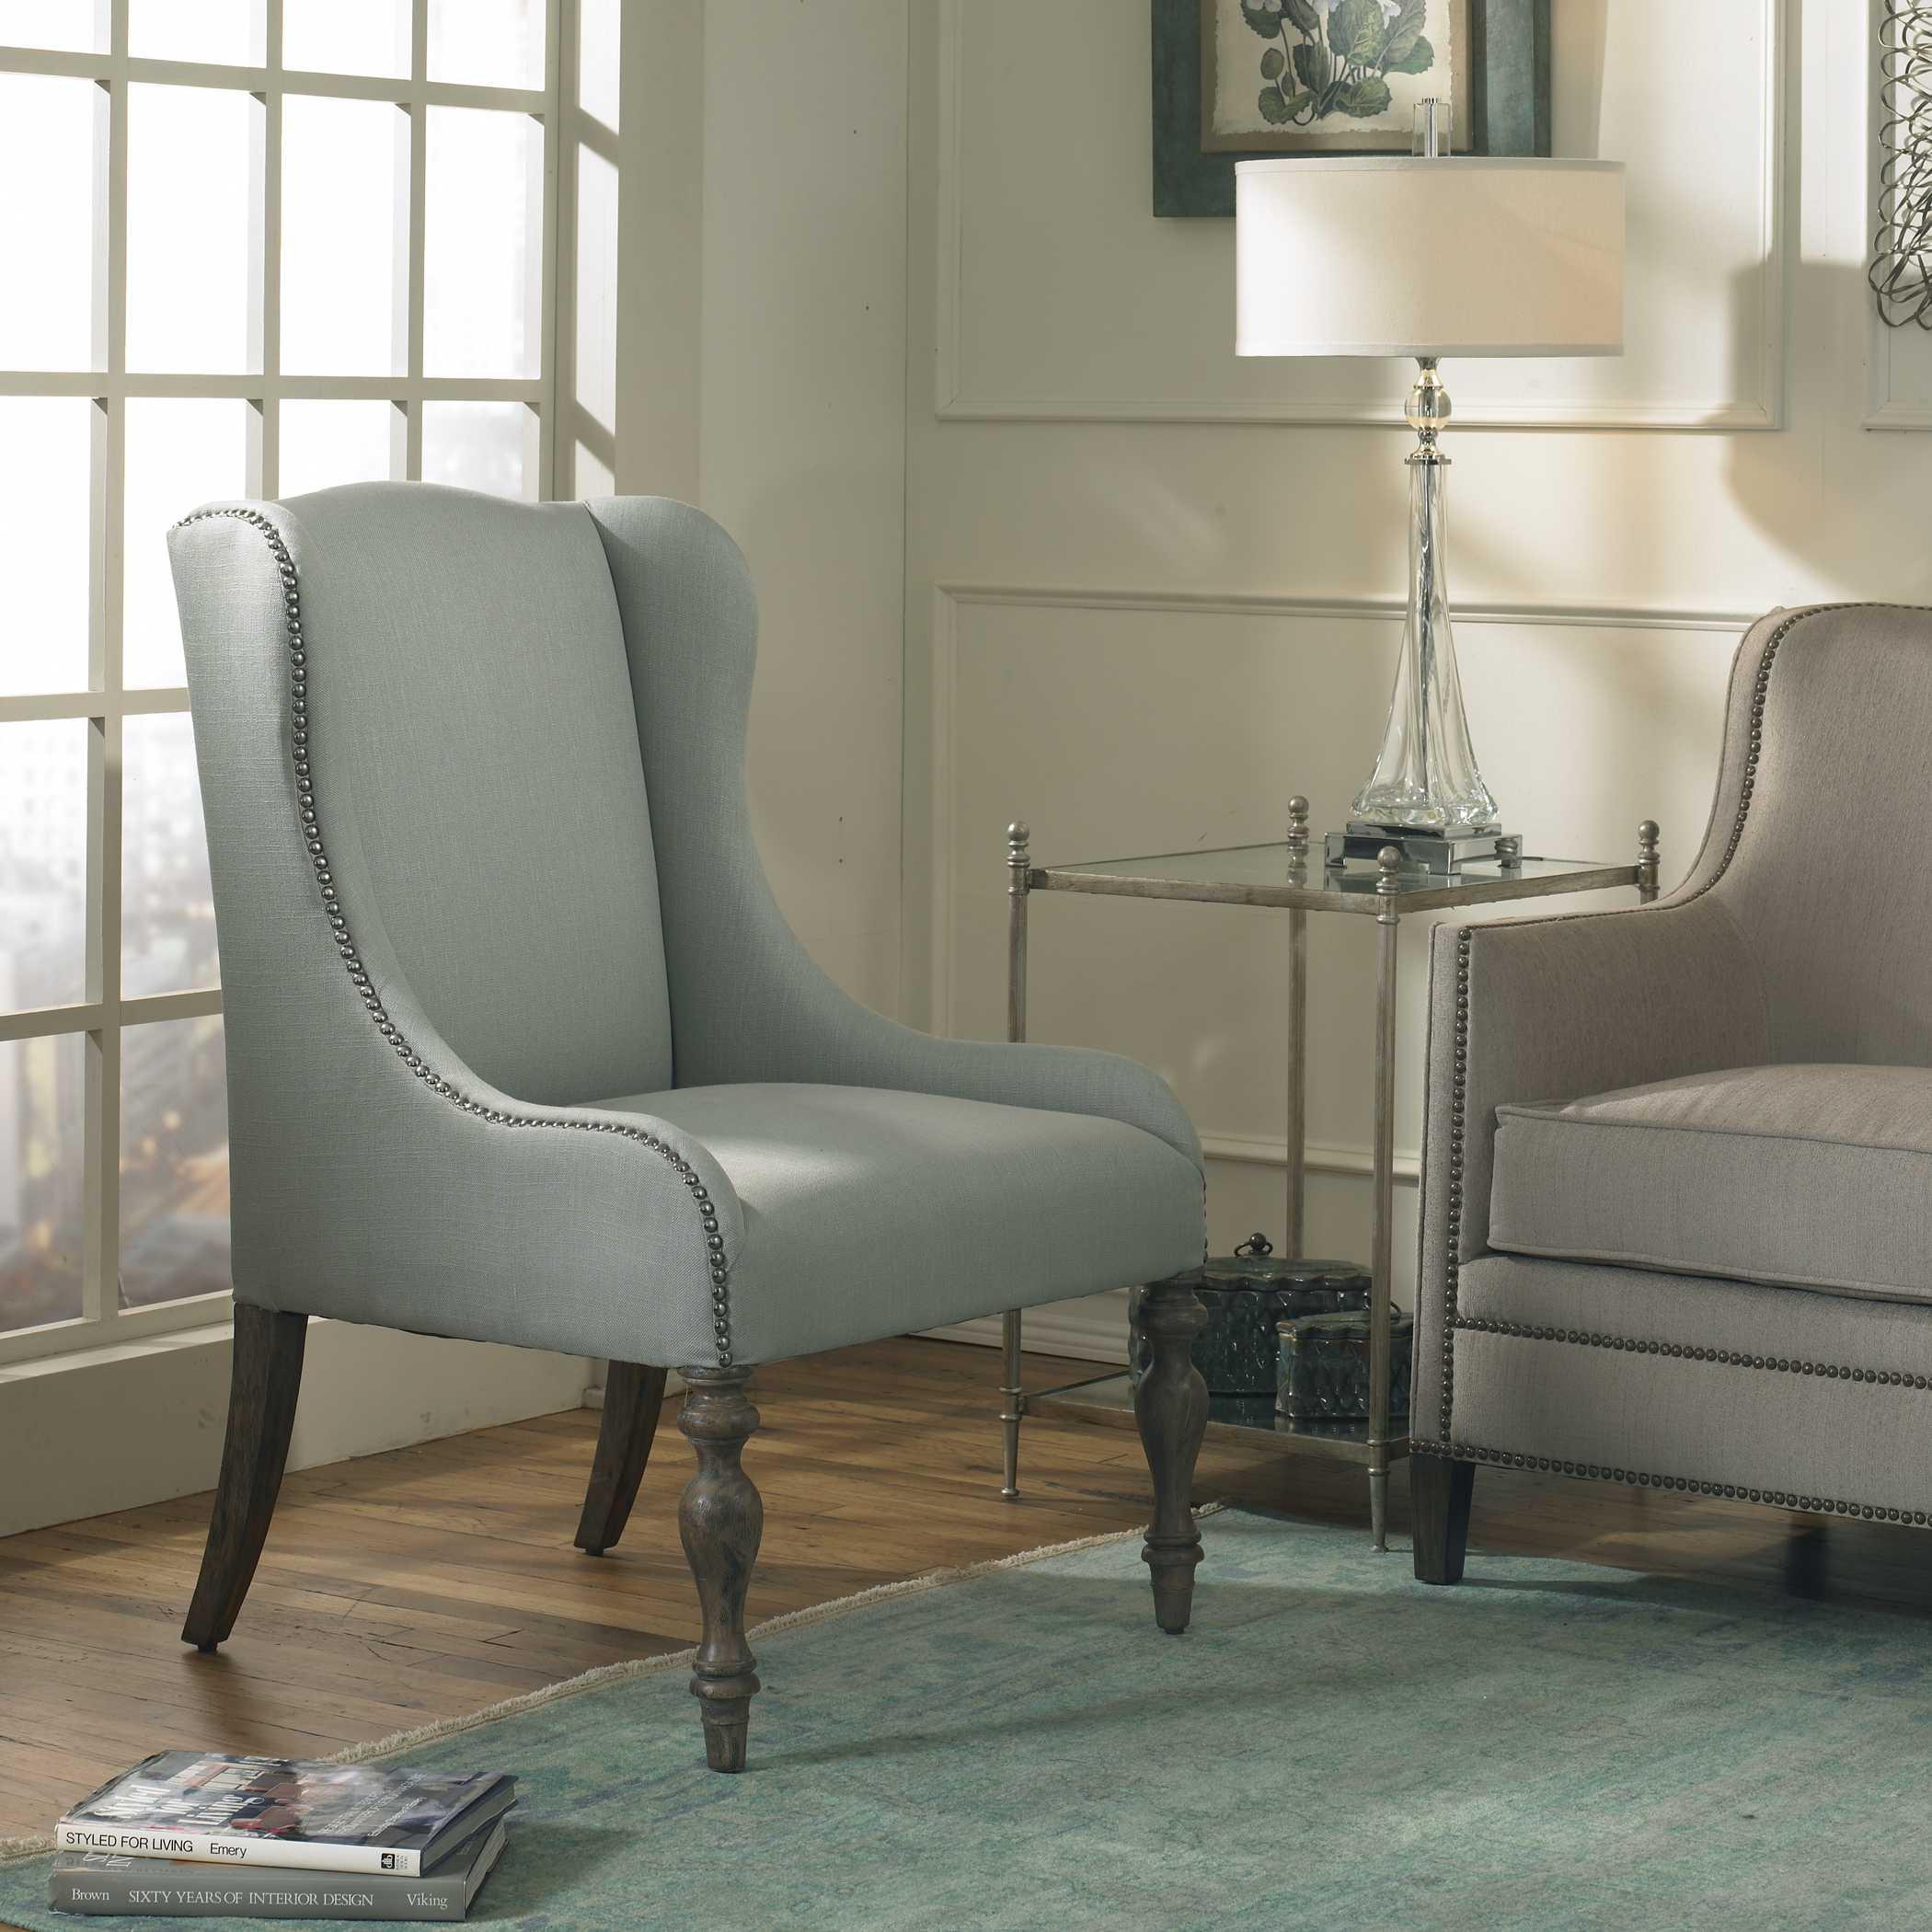 Uttermost Filon Wing Chair: Uttermost Filon Wing Accent Chair